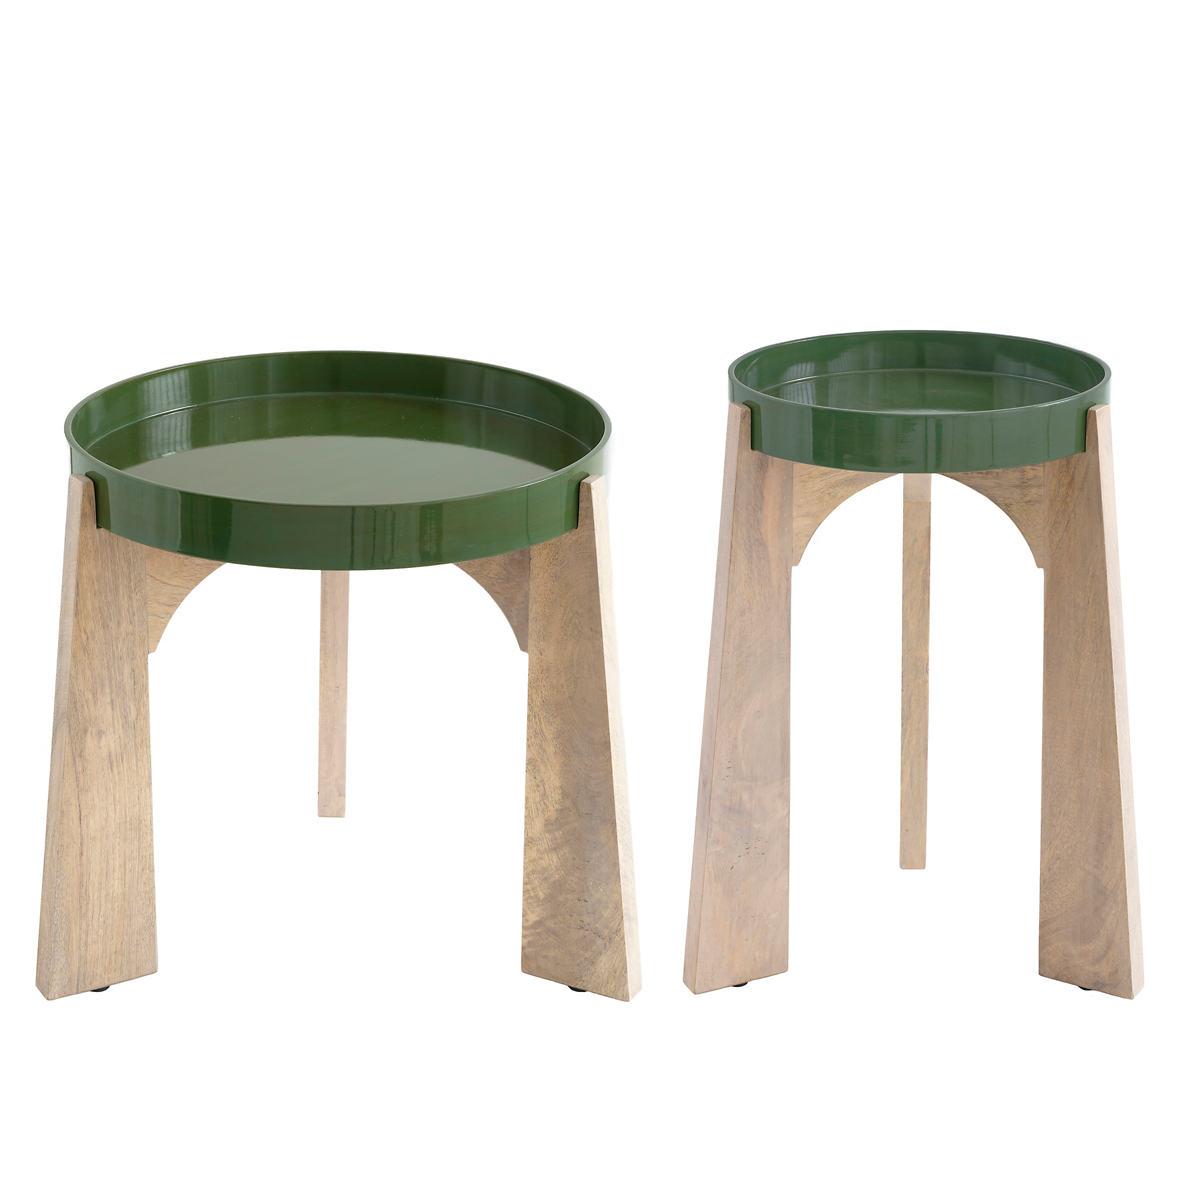 Evergreen Modular Side Table